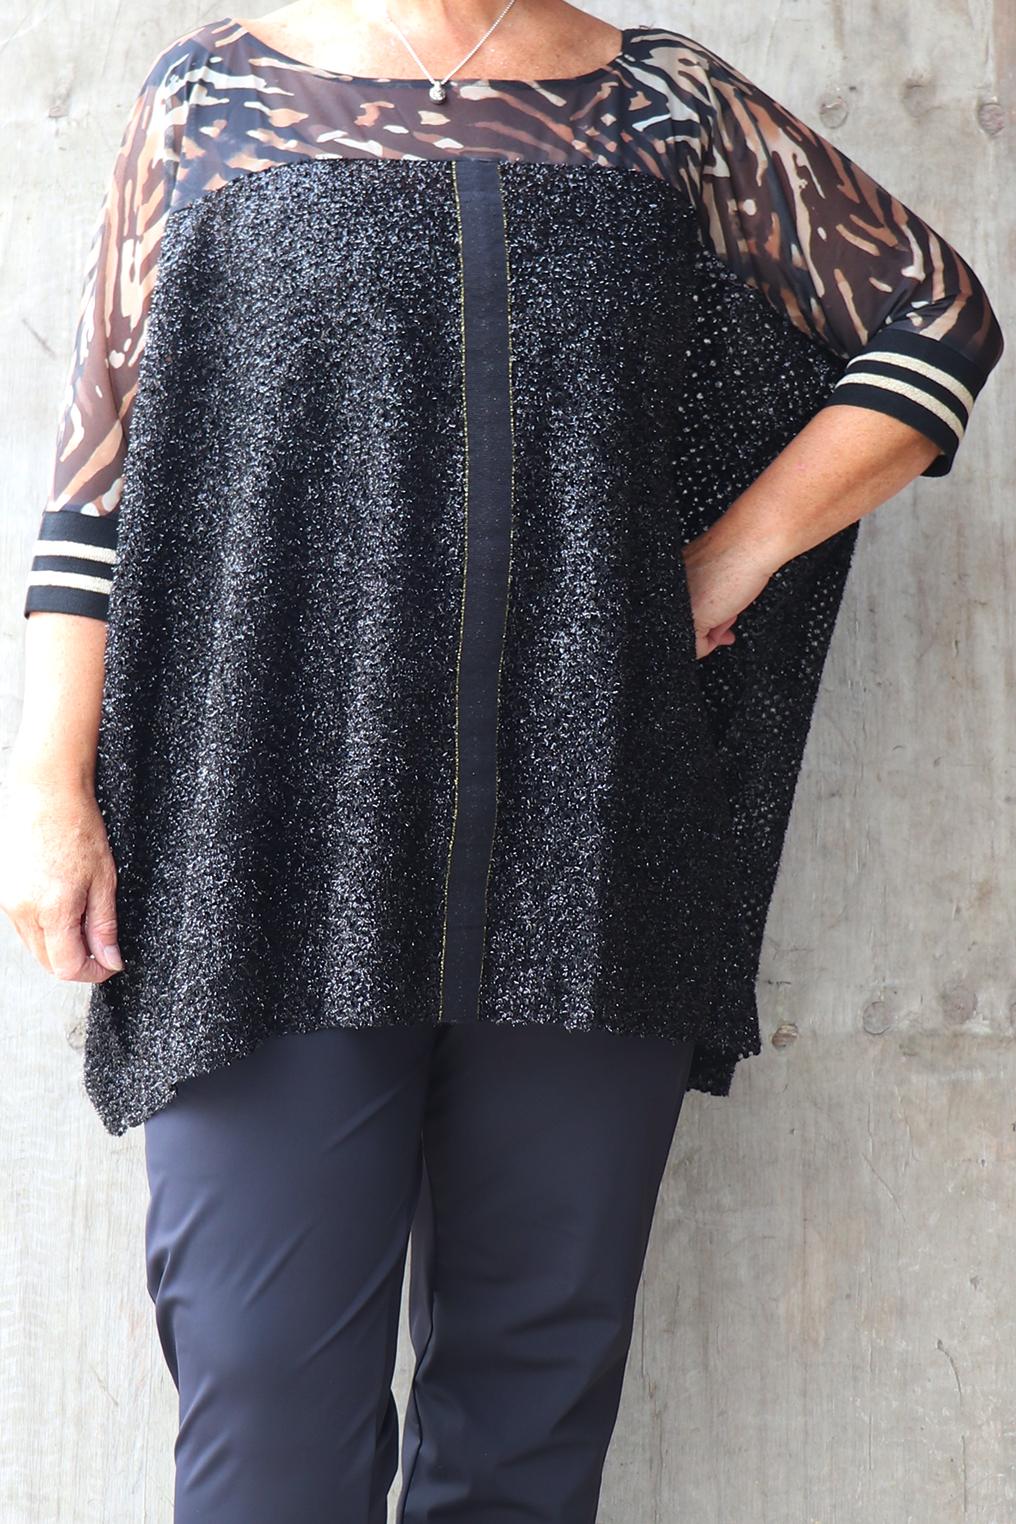 Tuniek Mat fashion voile met glitter